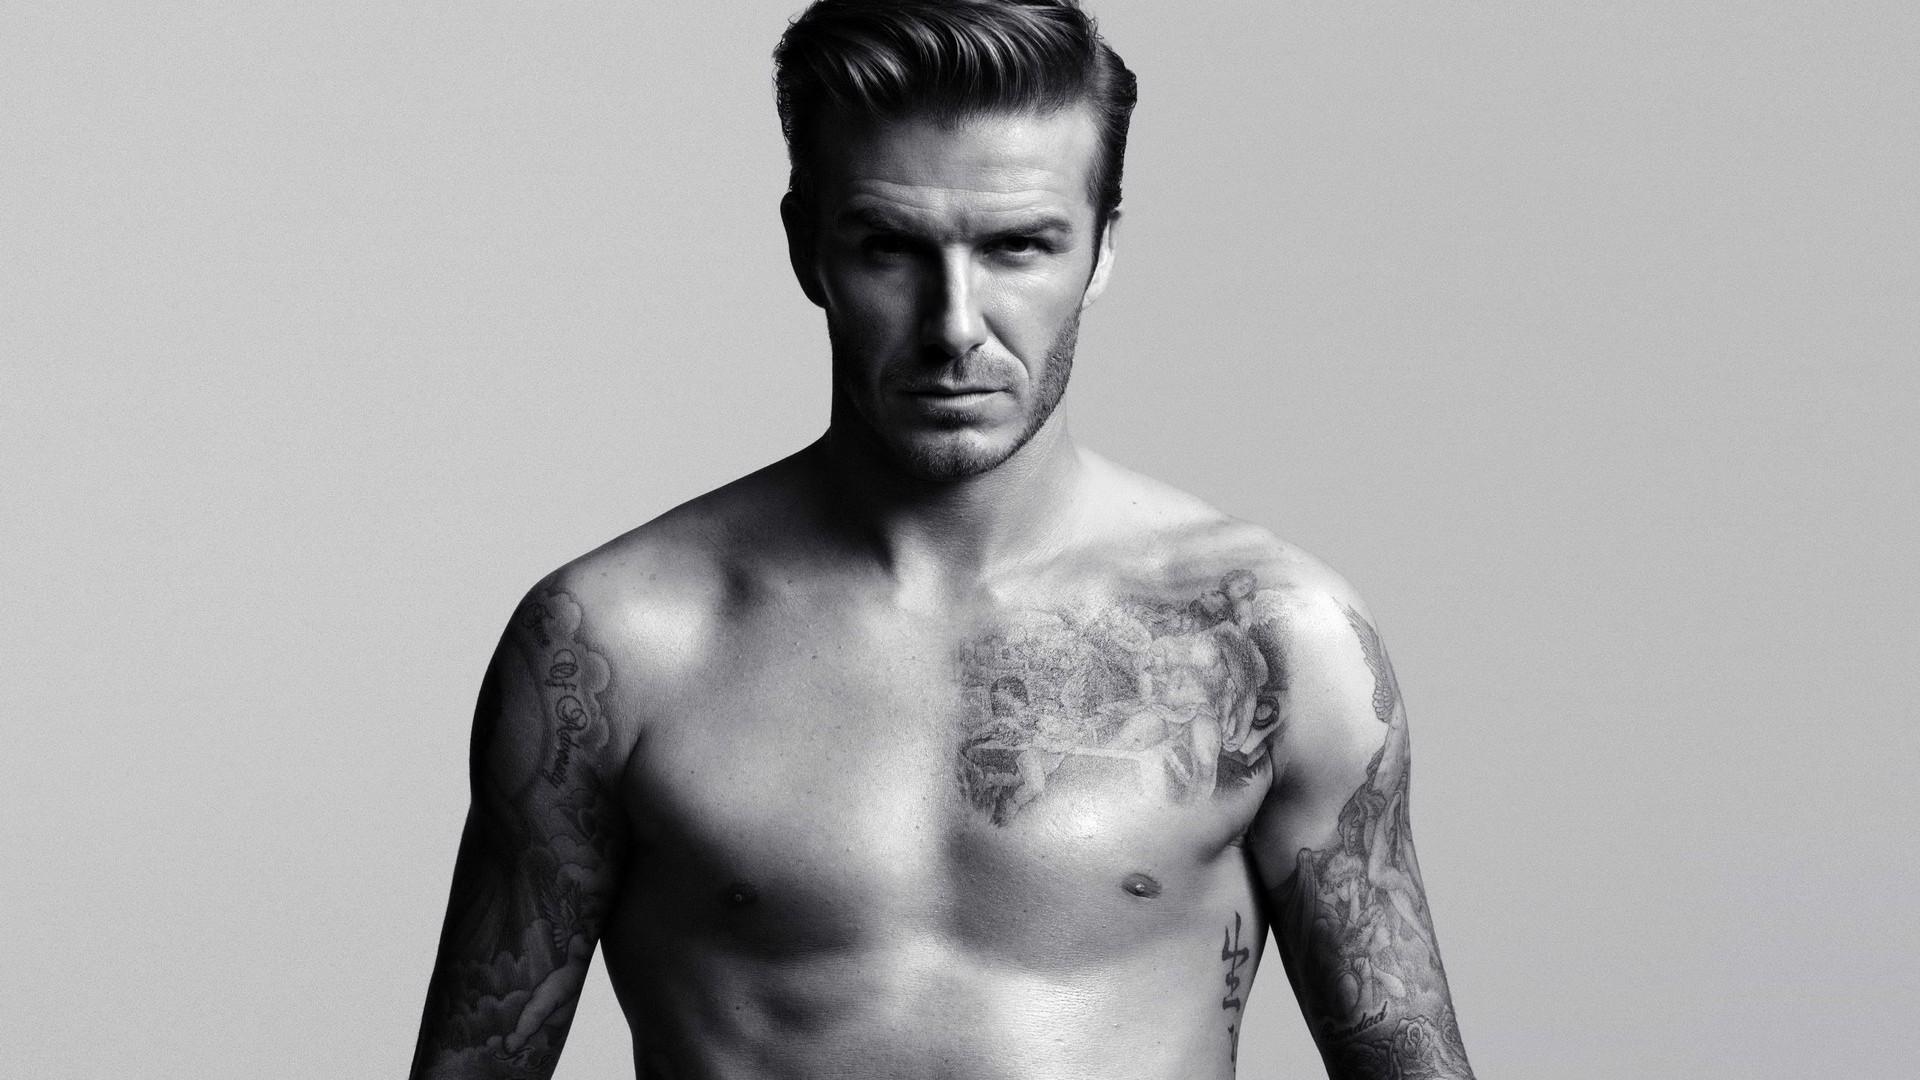 Res: 1920x1080, David Beckham Wallpaper